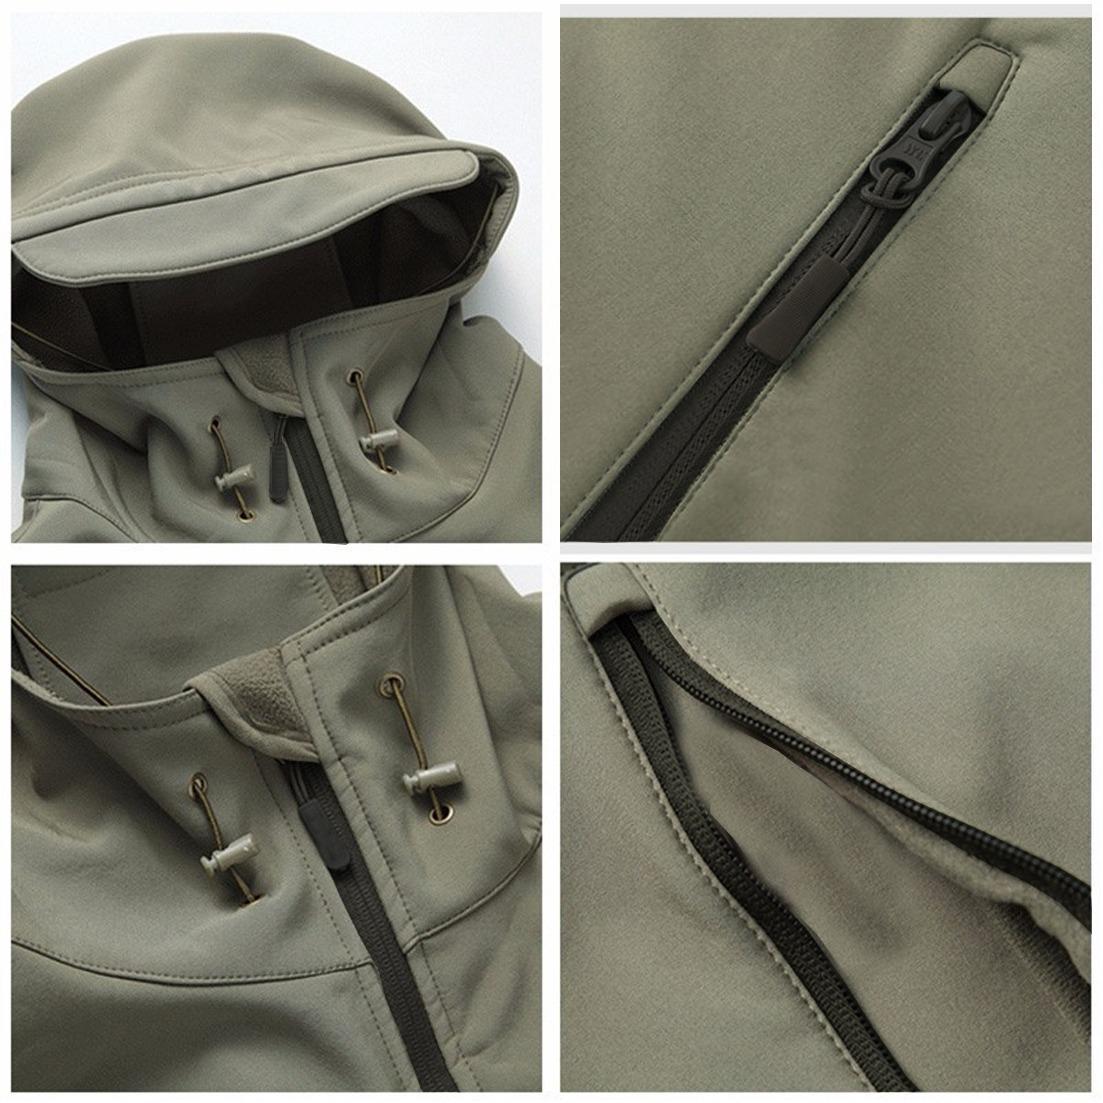 Cek Harga Baru Jaket Terbaru Tactical Tad Bravo Bahan Import Hijau Army Gear Anti Air Nyaman Dan Hangat Dipakai Cocok